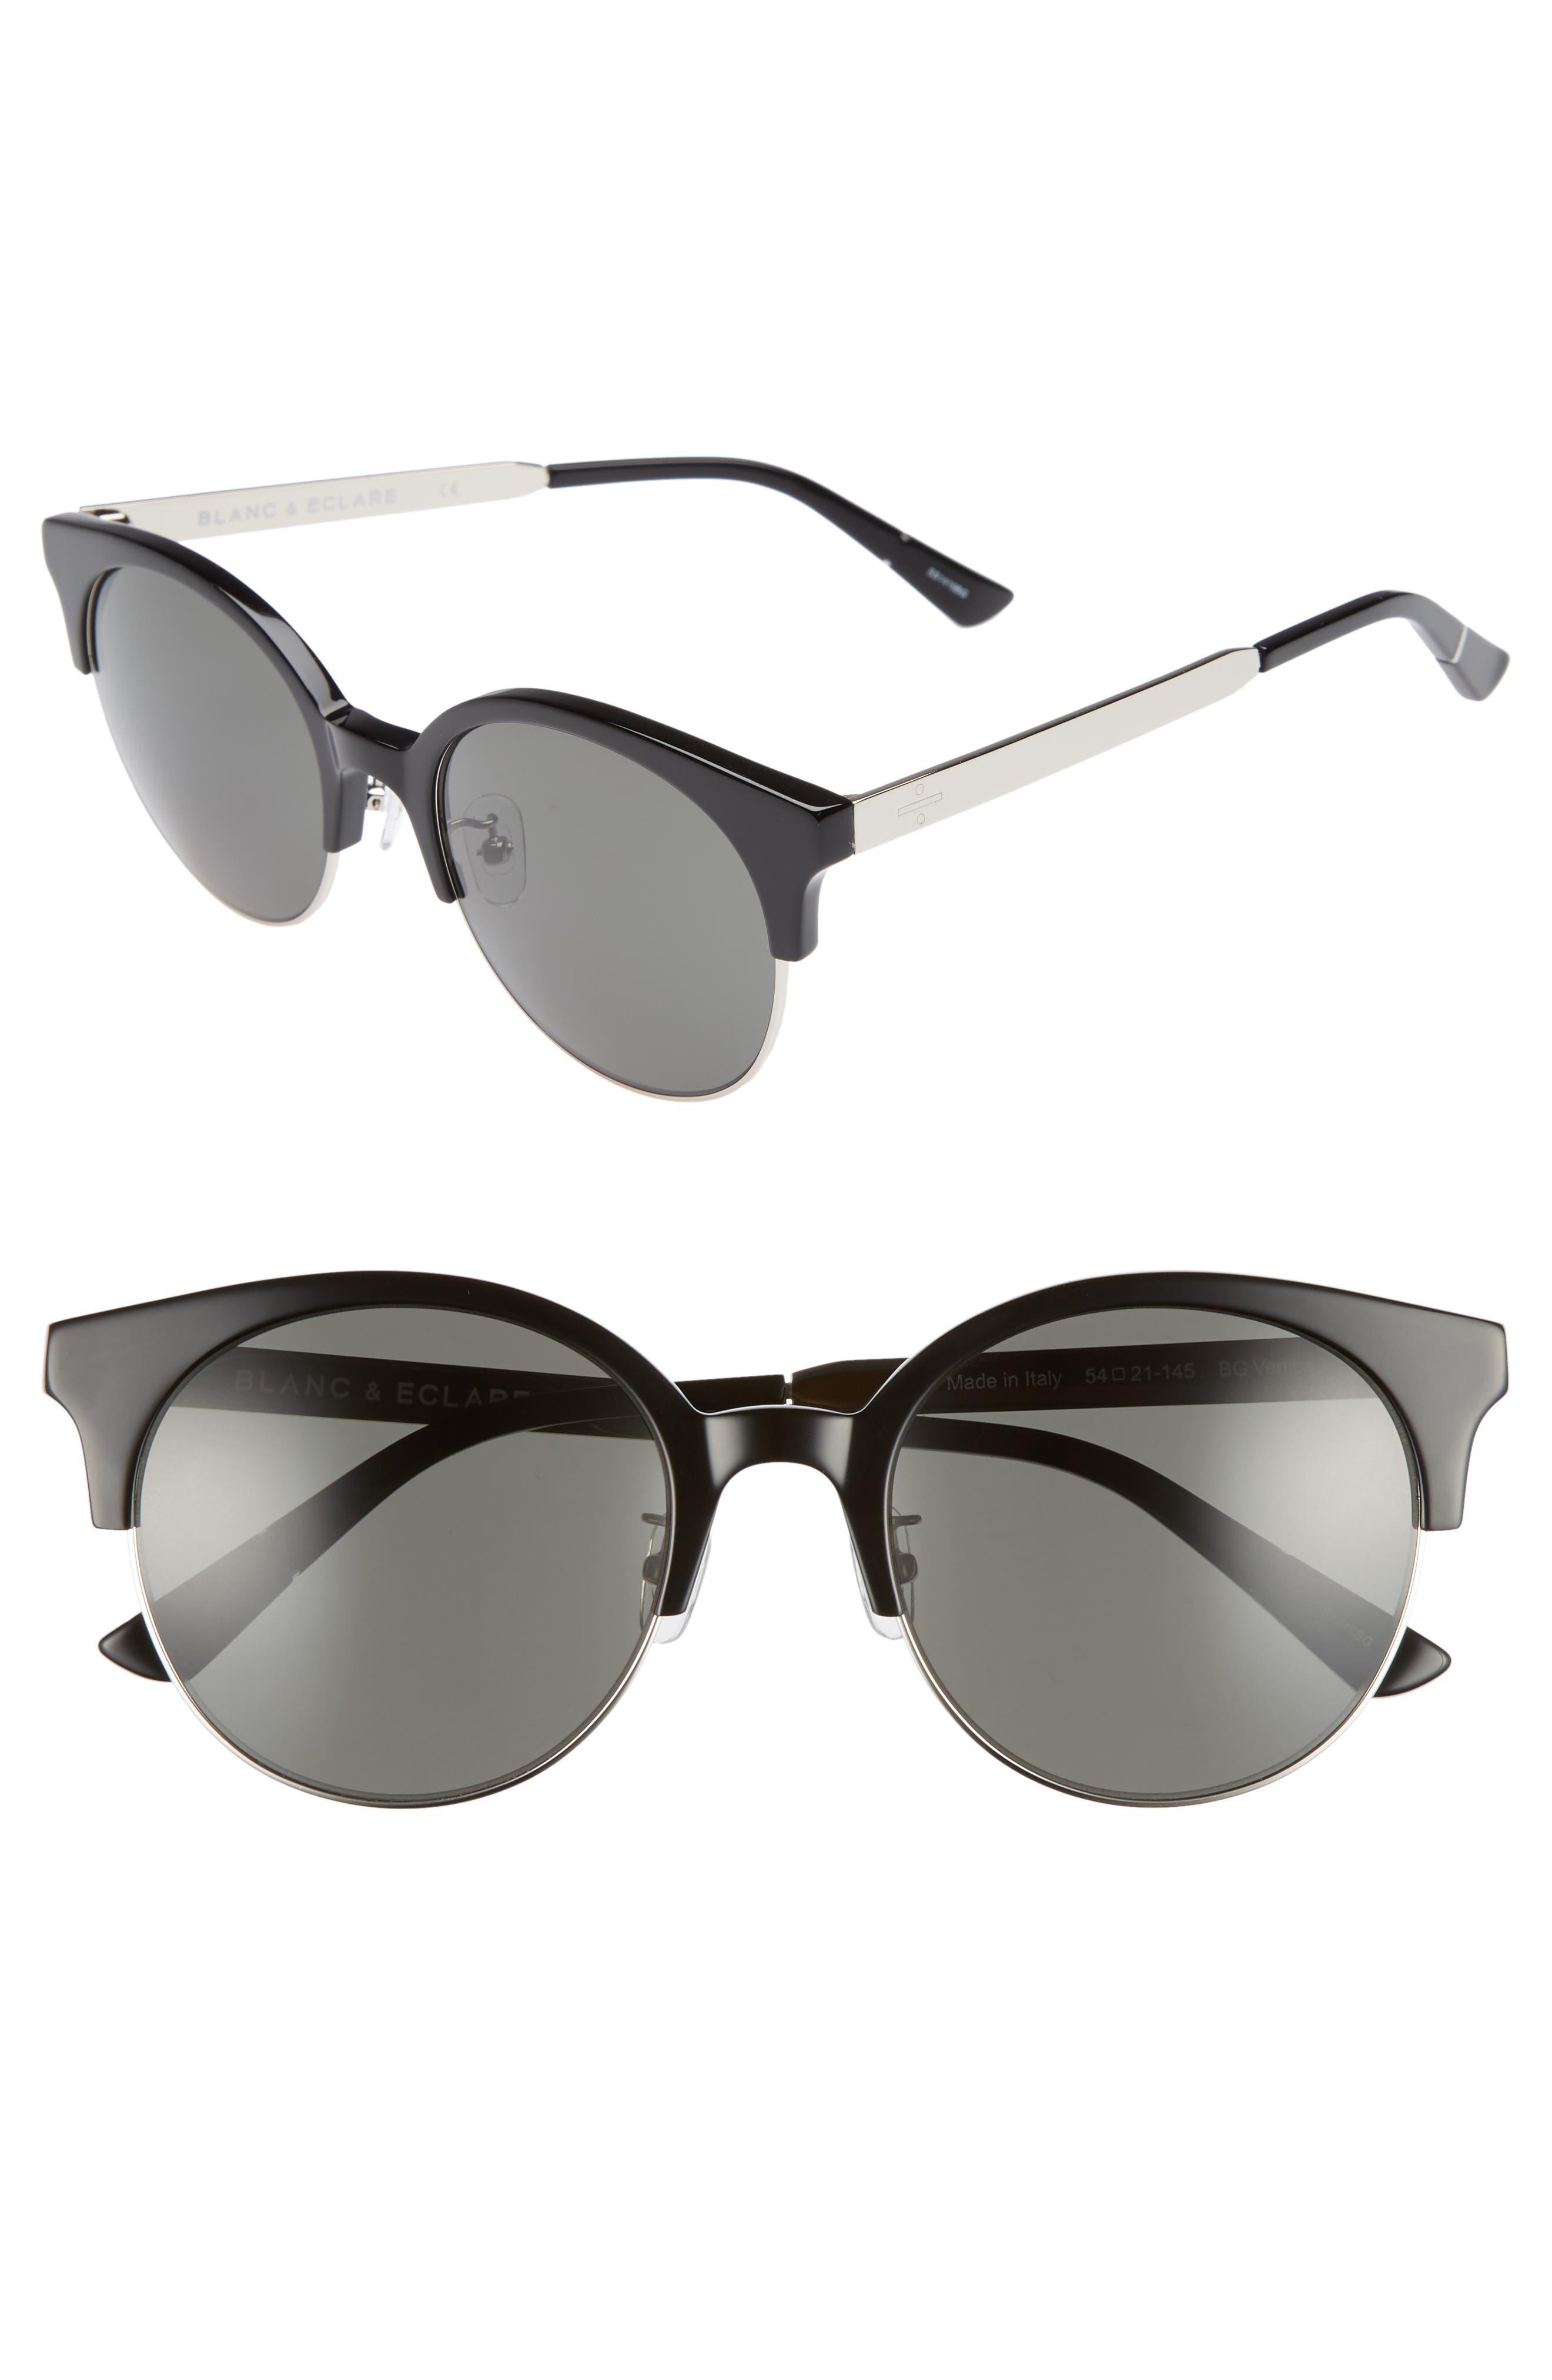 BLANC & ECLARE Venice Round Sunglasses,                         Main,                         color,